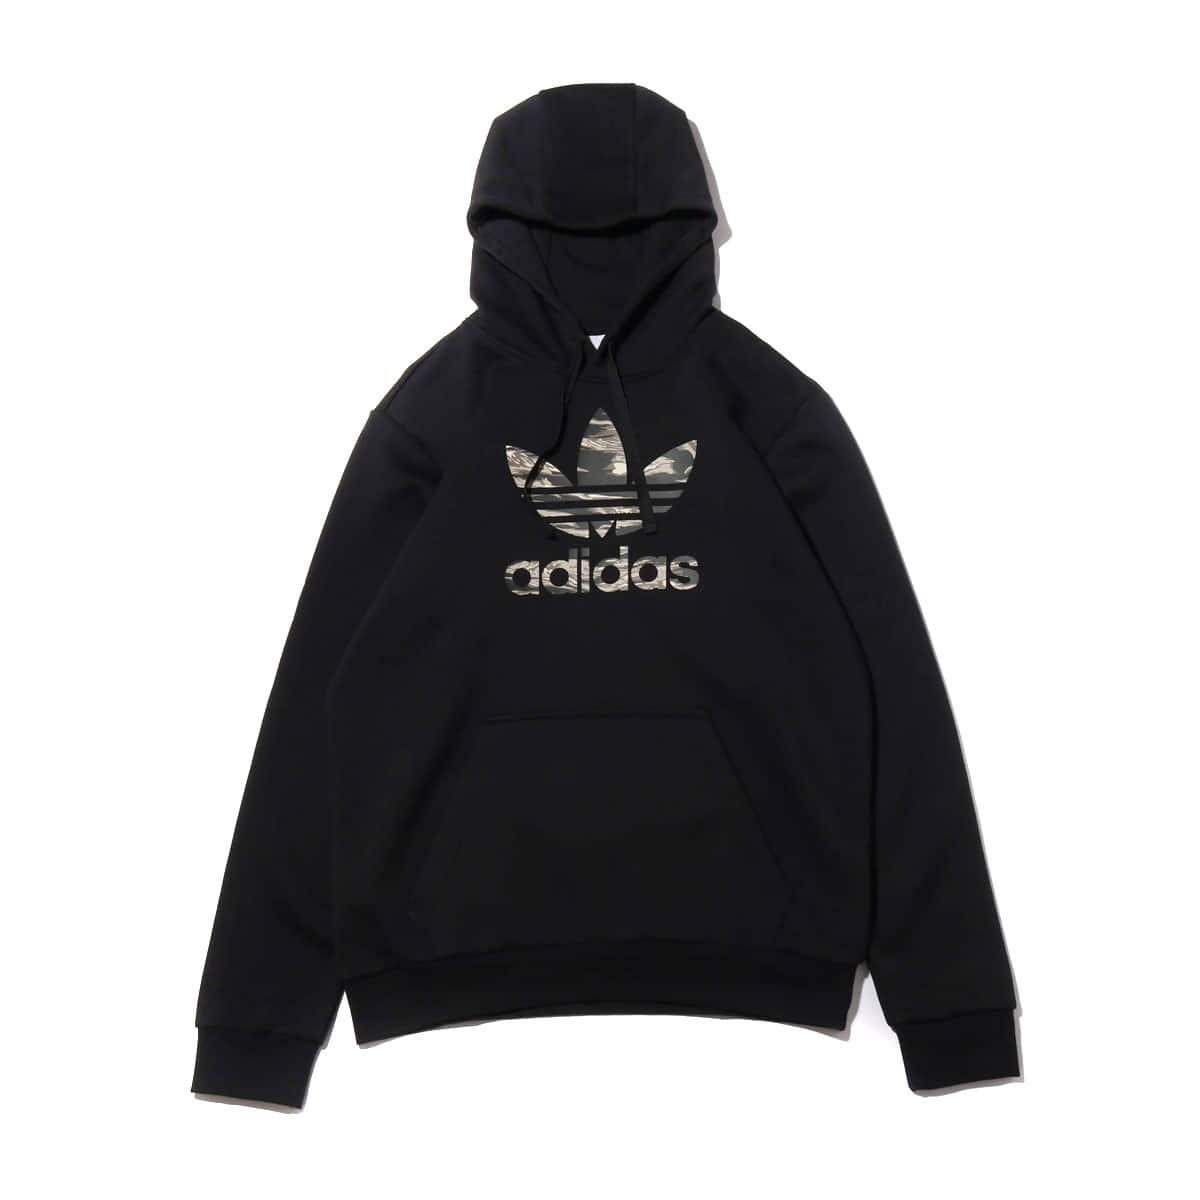 adidas CAMO TREFOIL HOODIE BLACK 19FW-I_photo_large